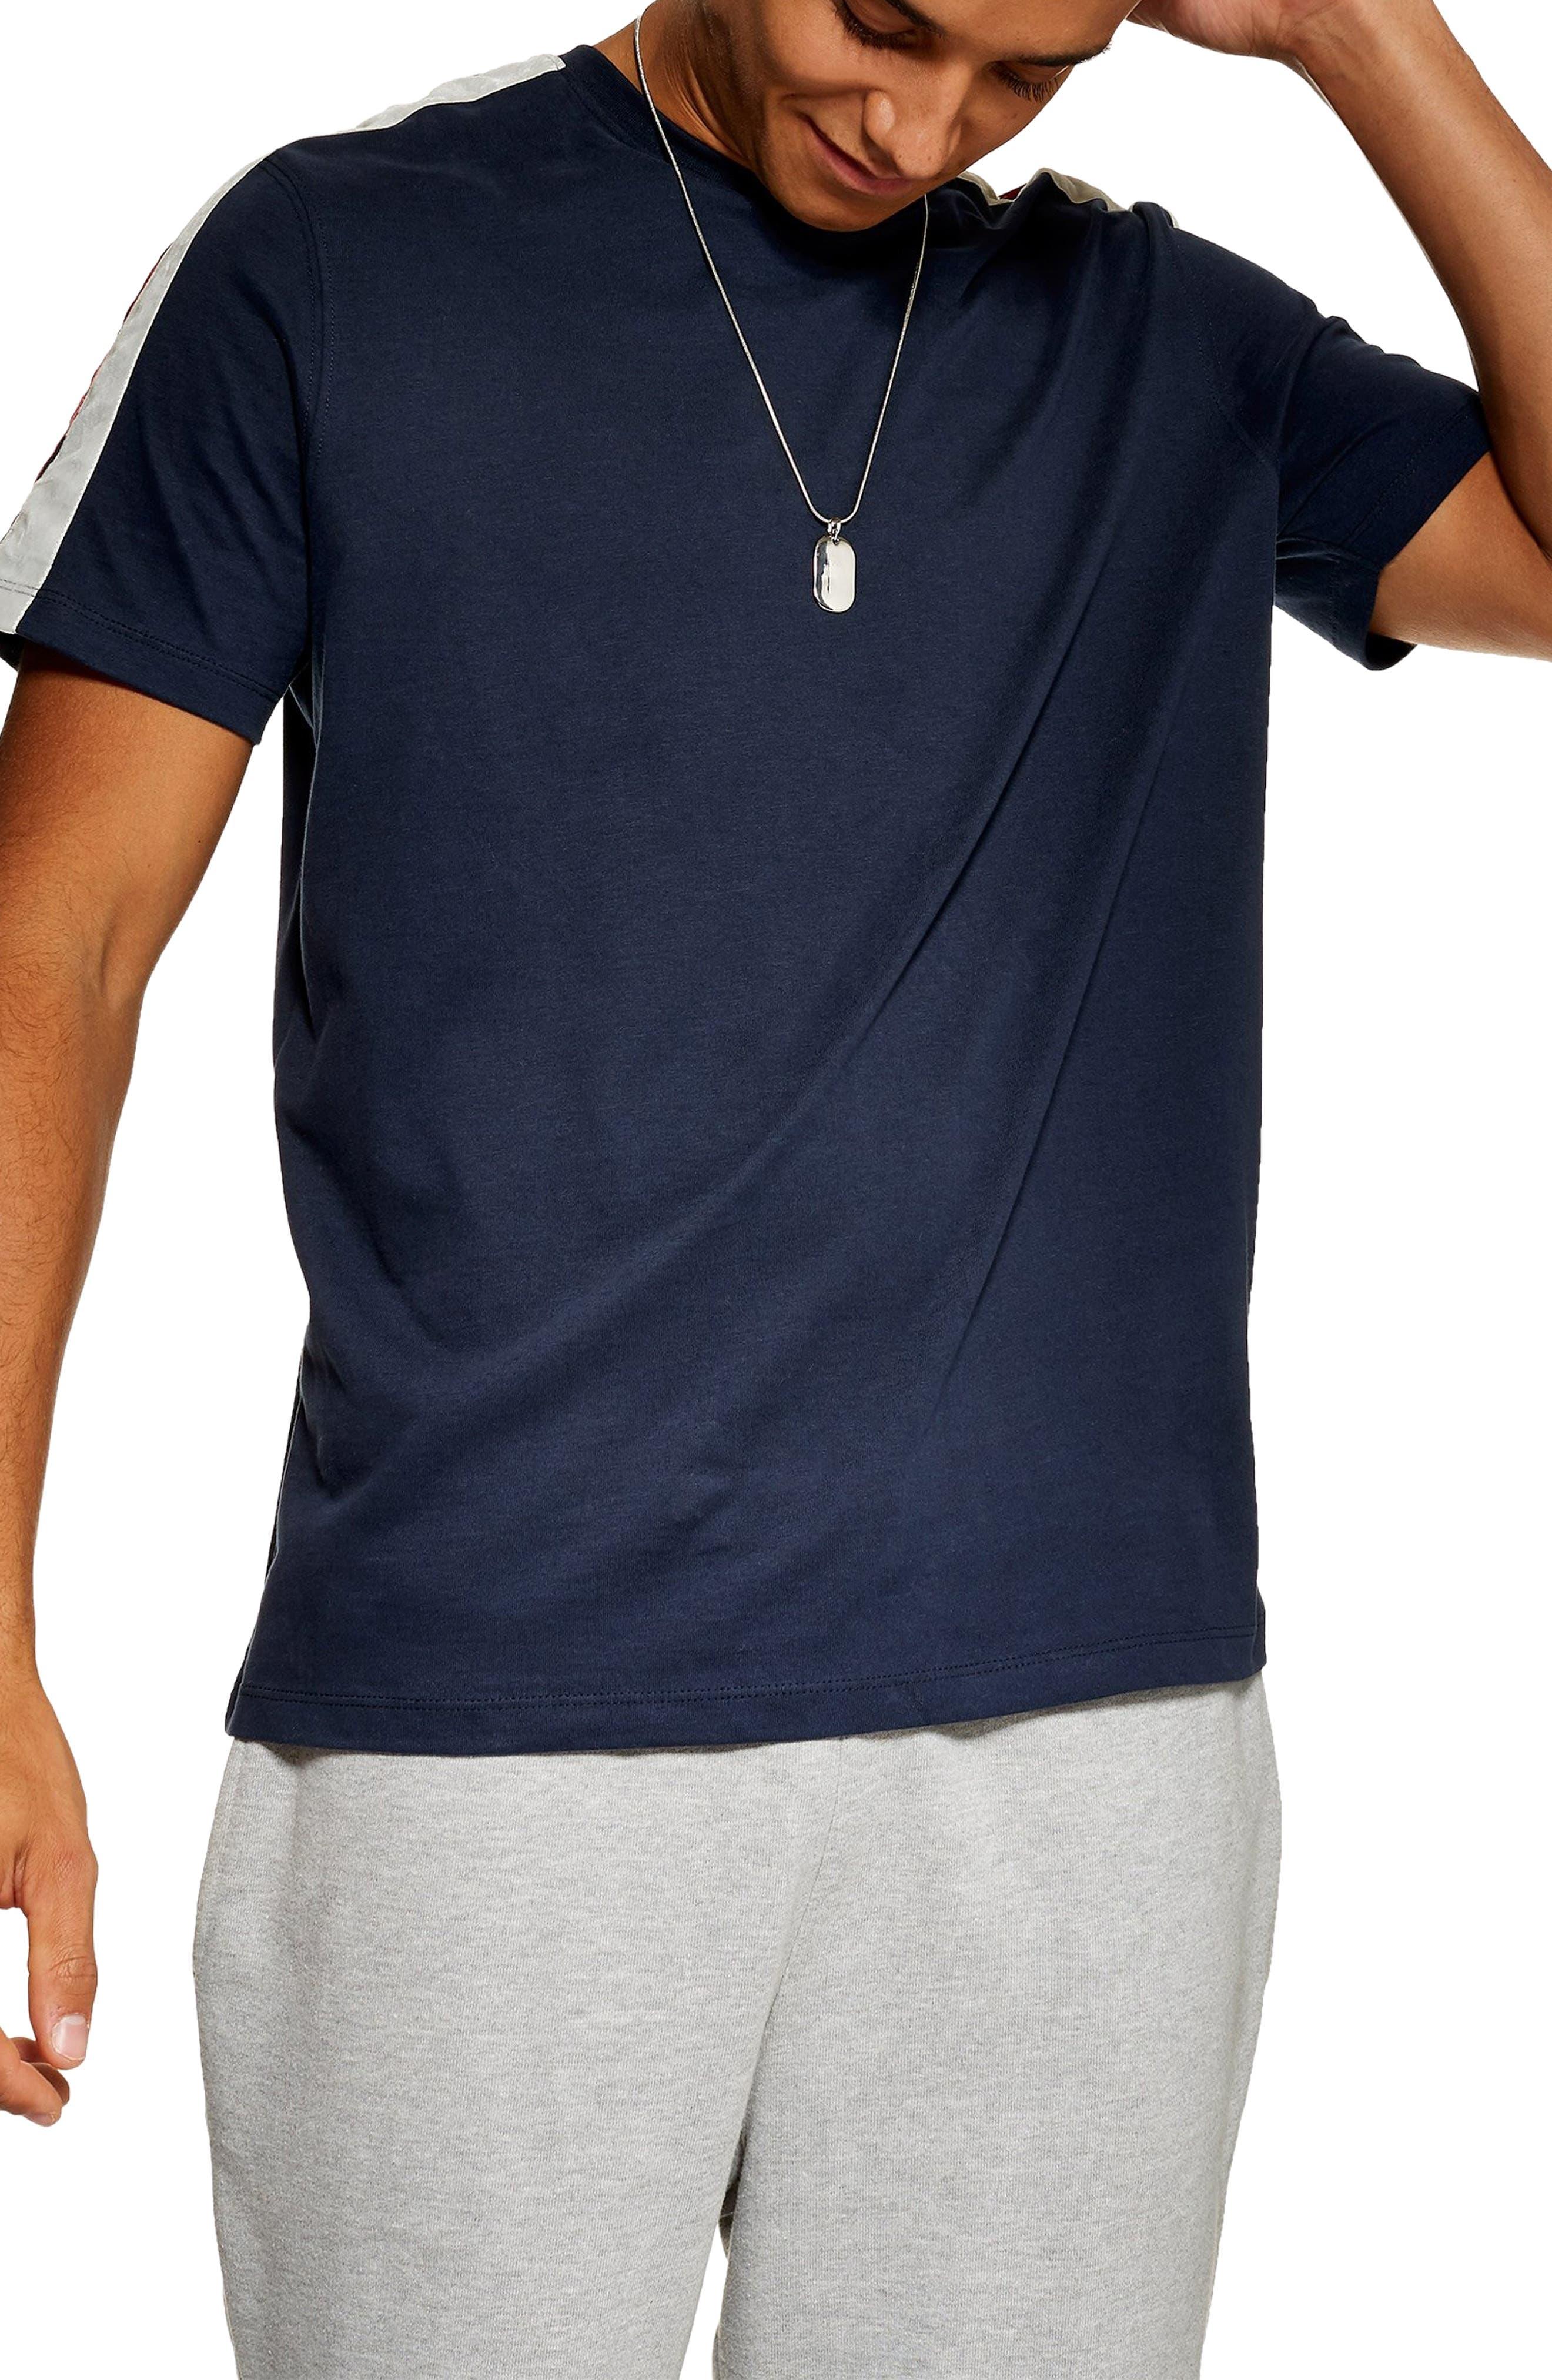 Velour Taped T-Shirt,                             Main thumbnail 1, color,                             NAVY BLUE